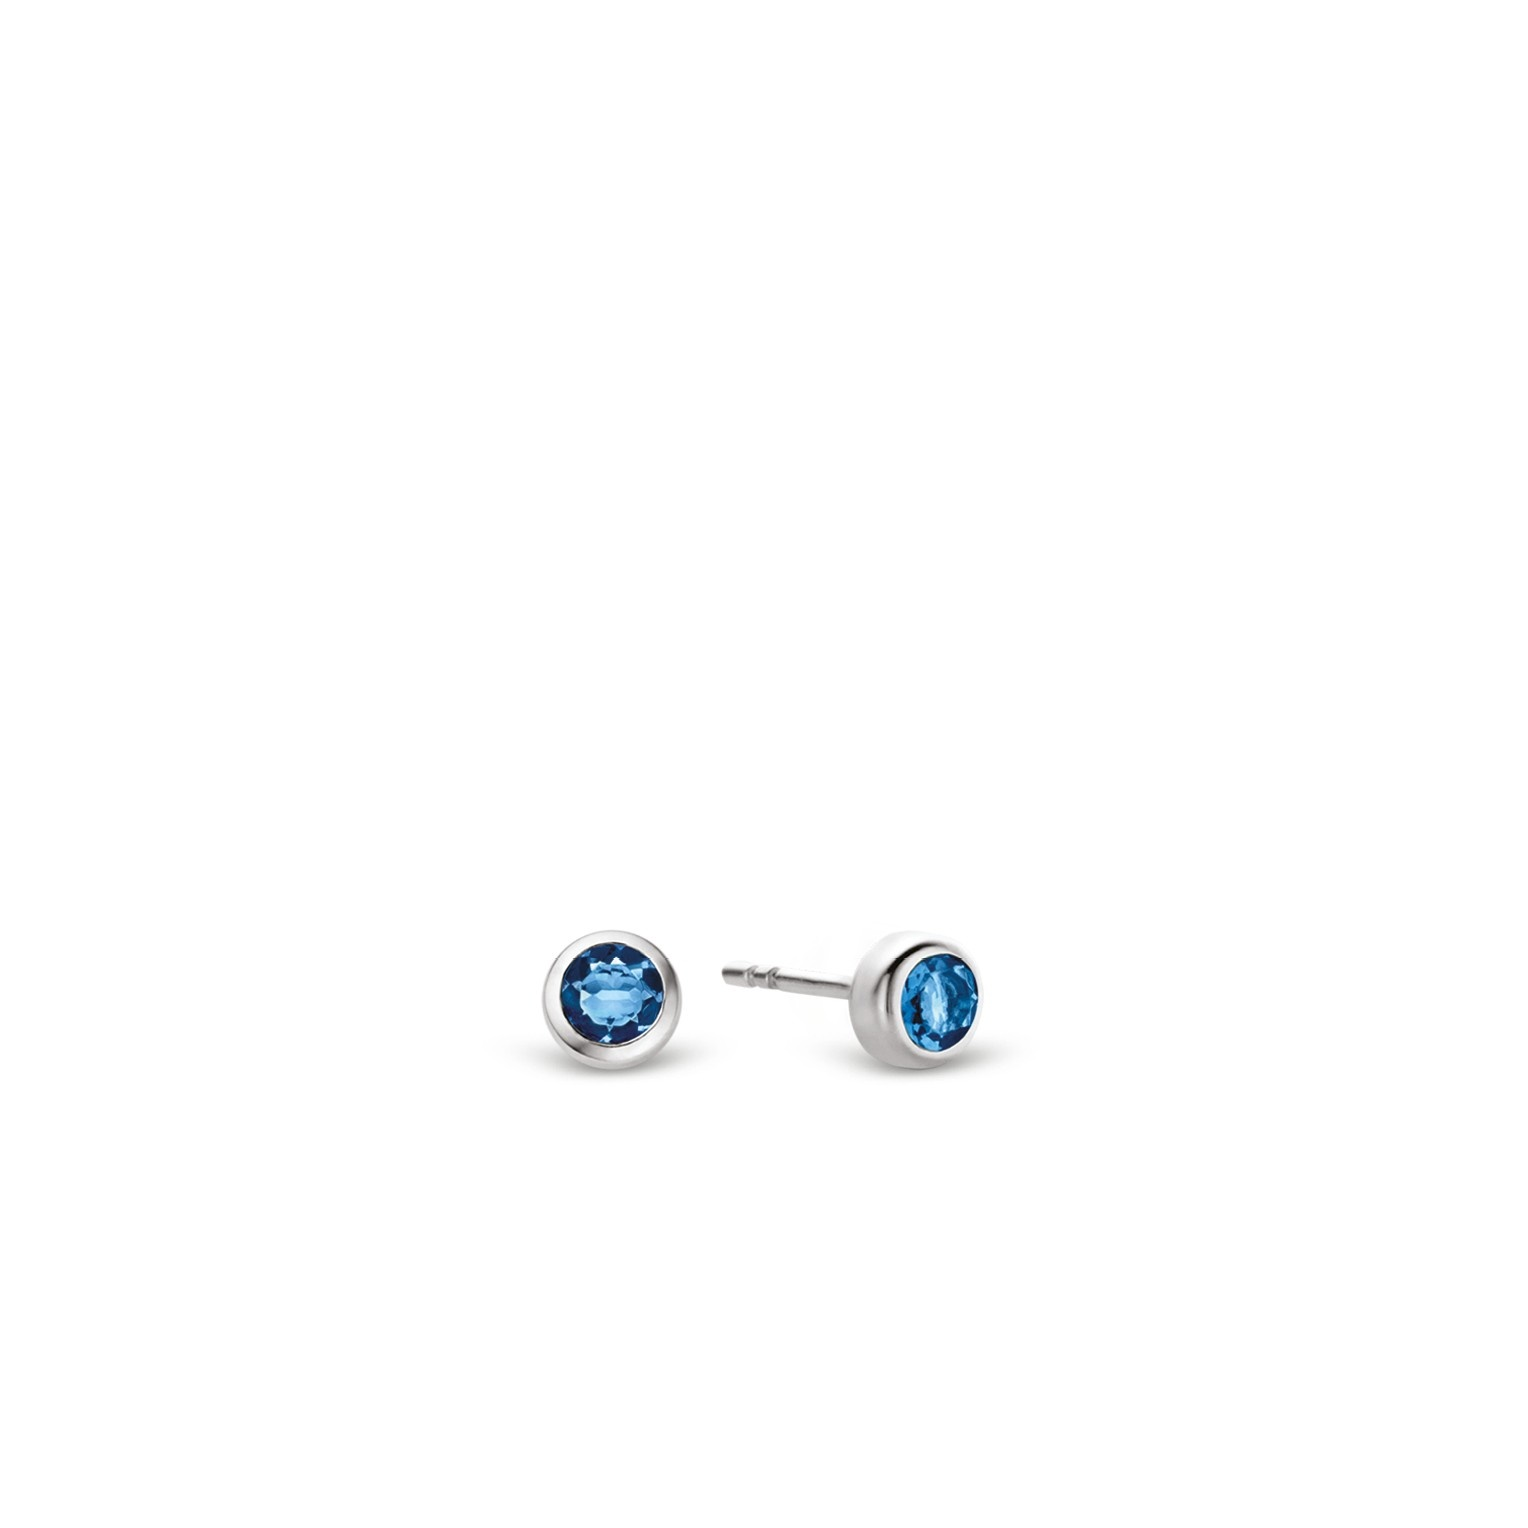 TI SENTO - Milano Earrings 7597DB-3